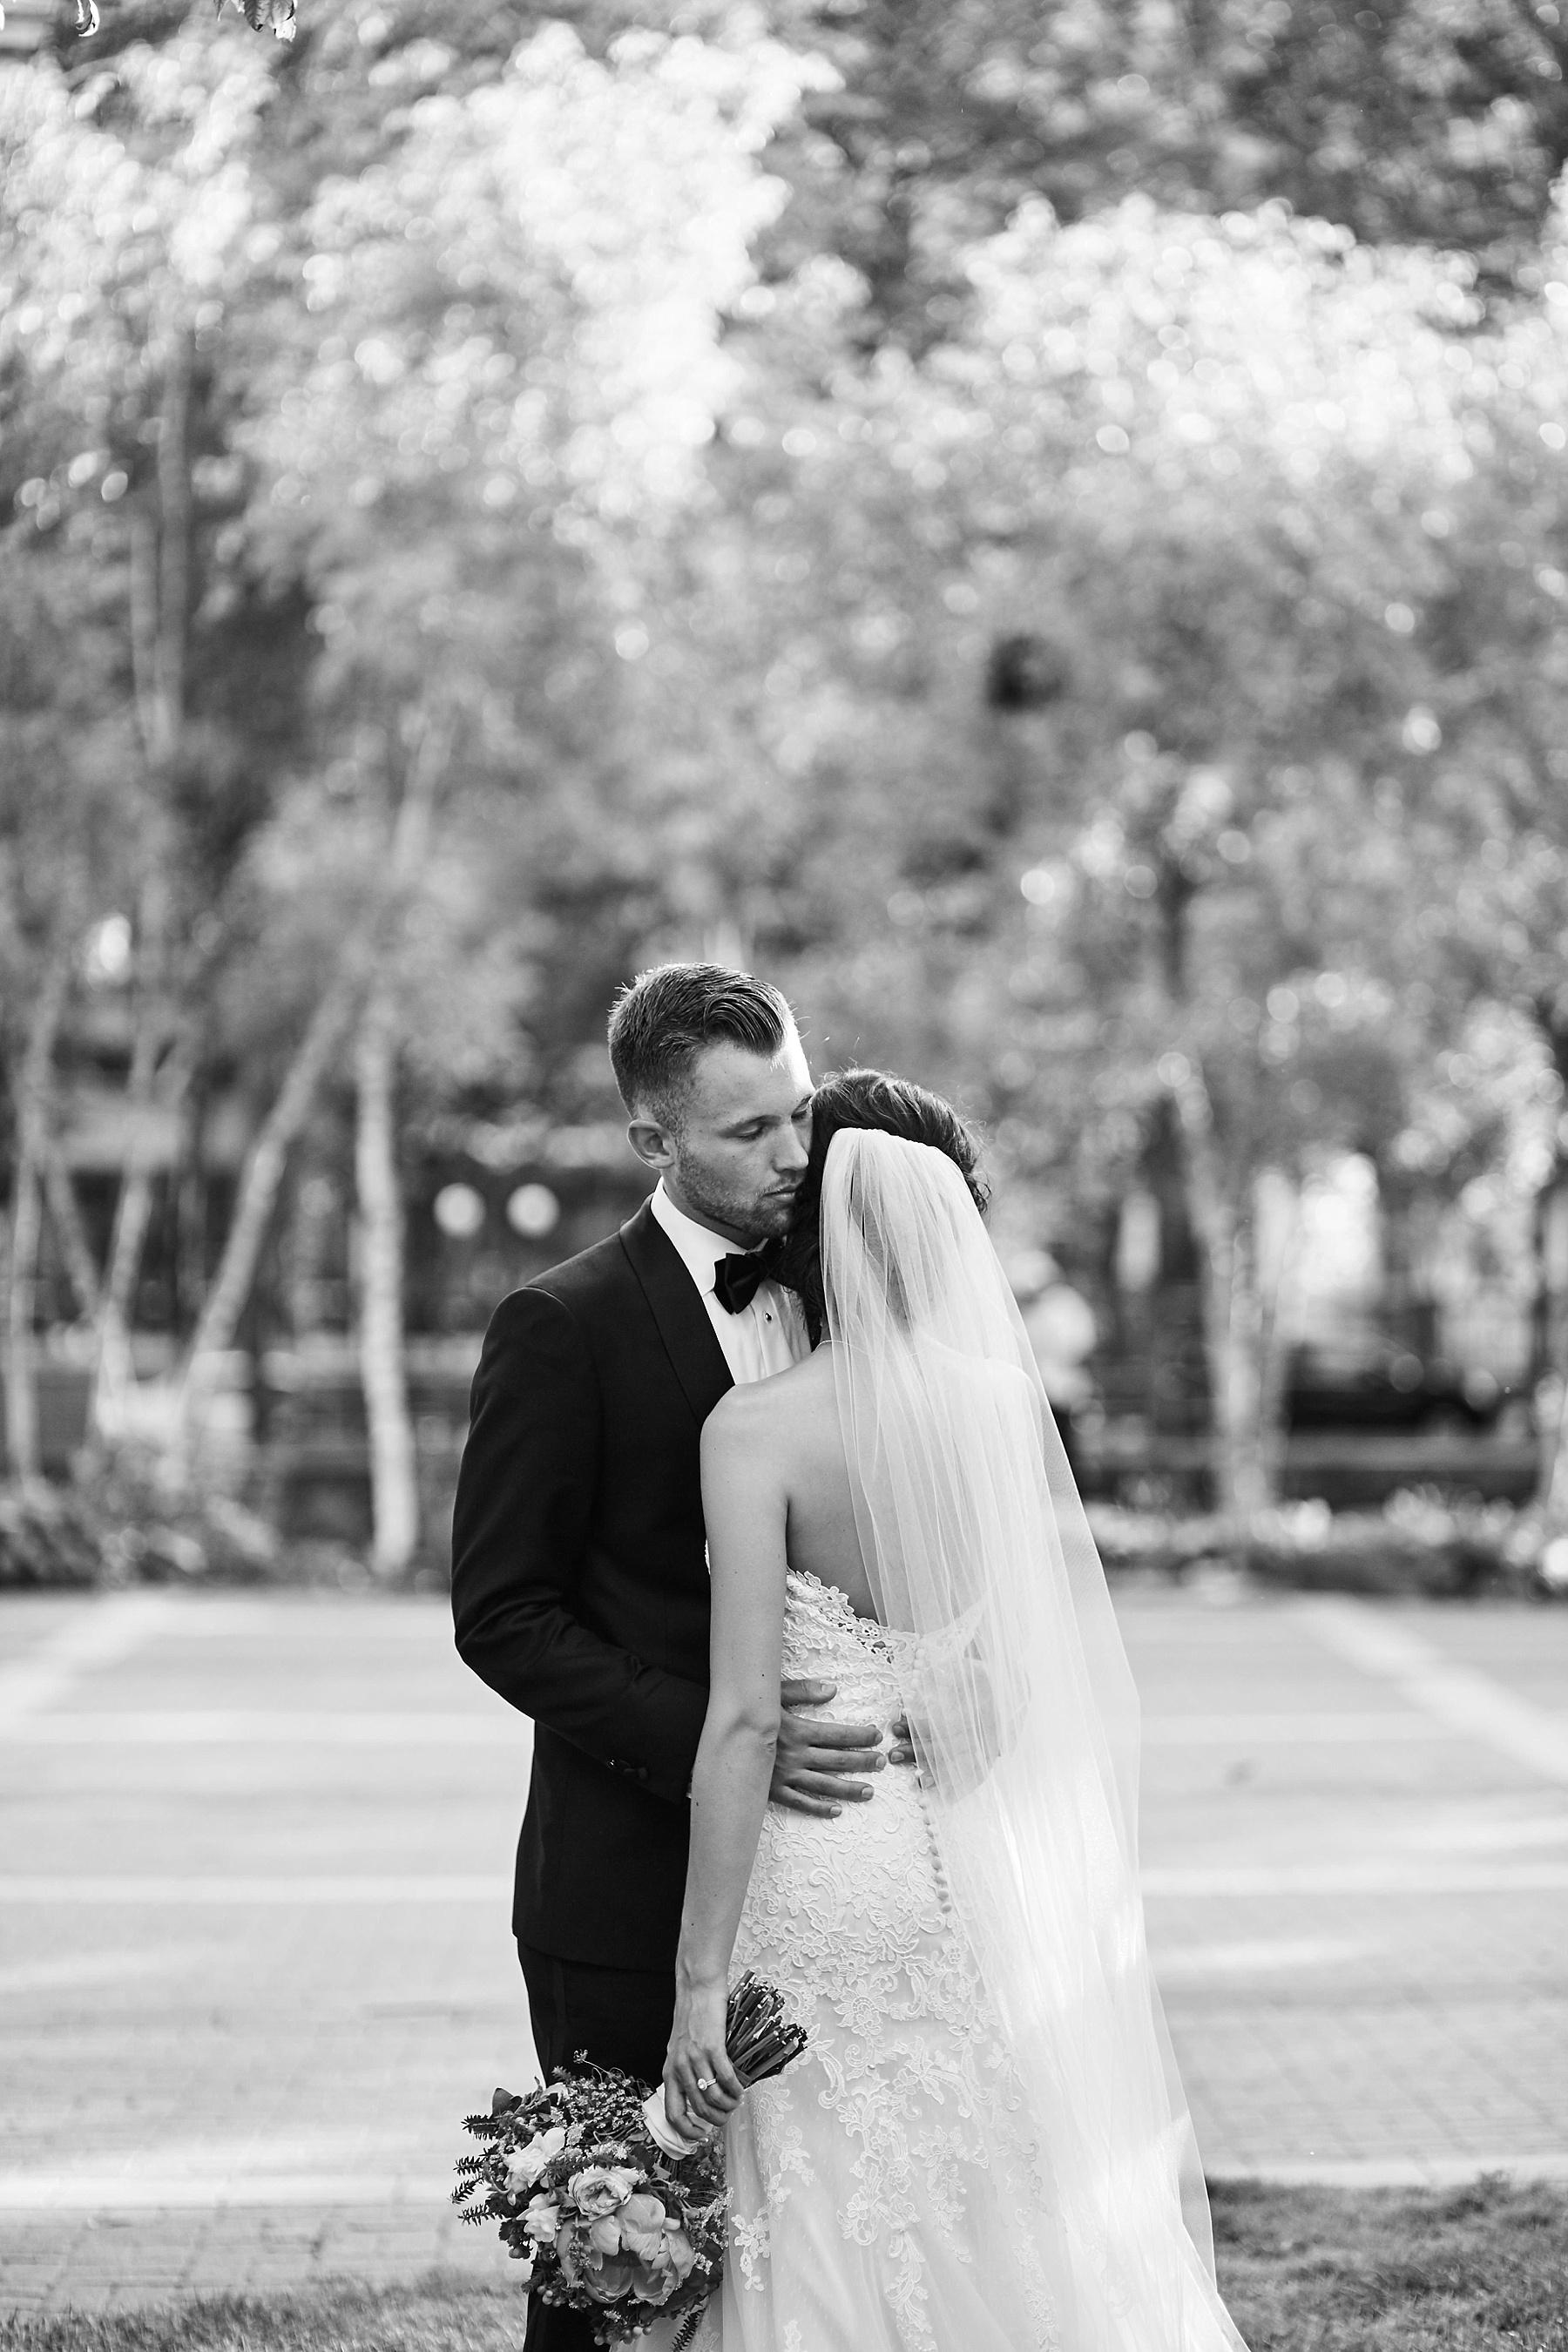 ABULAE-Wedding-Saint-paul-MN-Josh-Sofia-Wedding-Mears-Park_0802.jpg